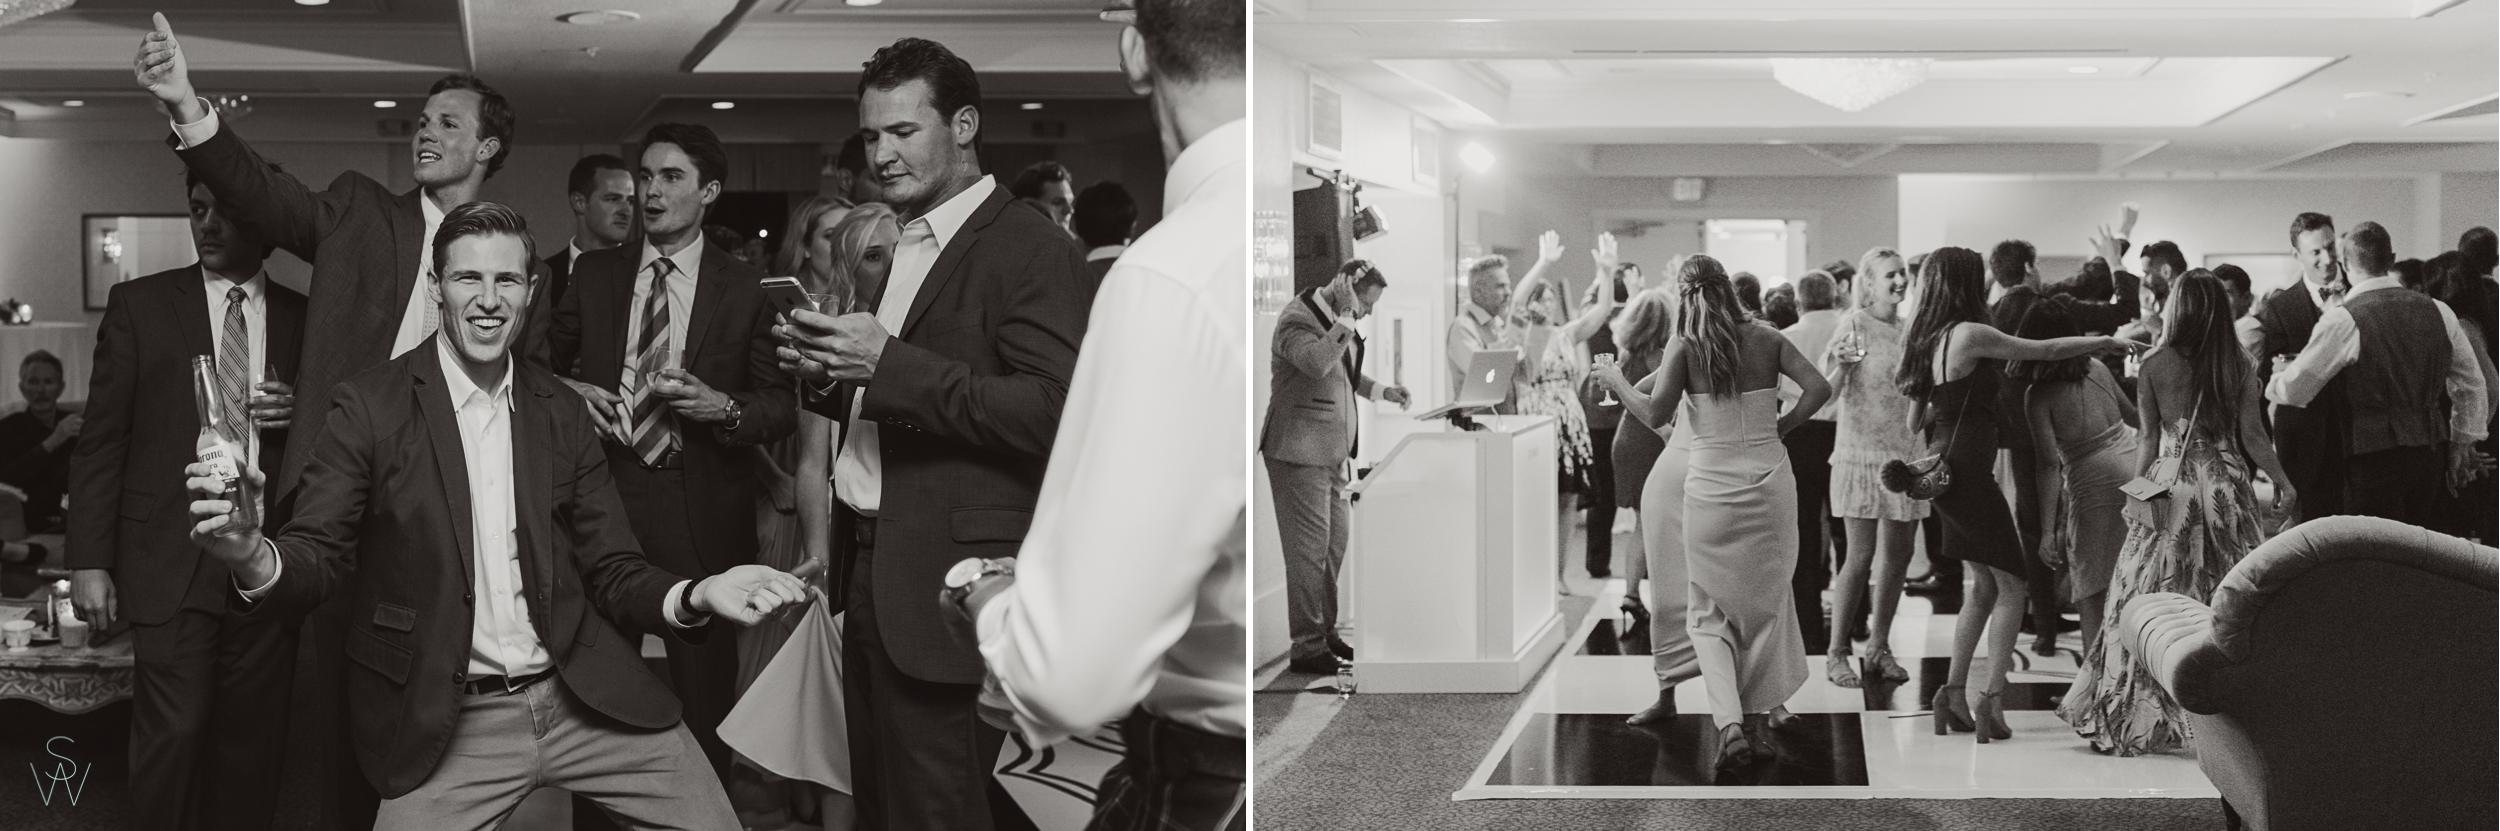 242Lauberge.shewanders.wedding.photography.JPG